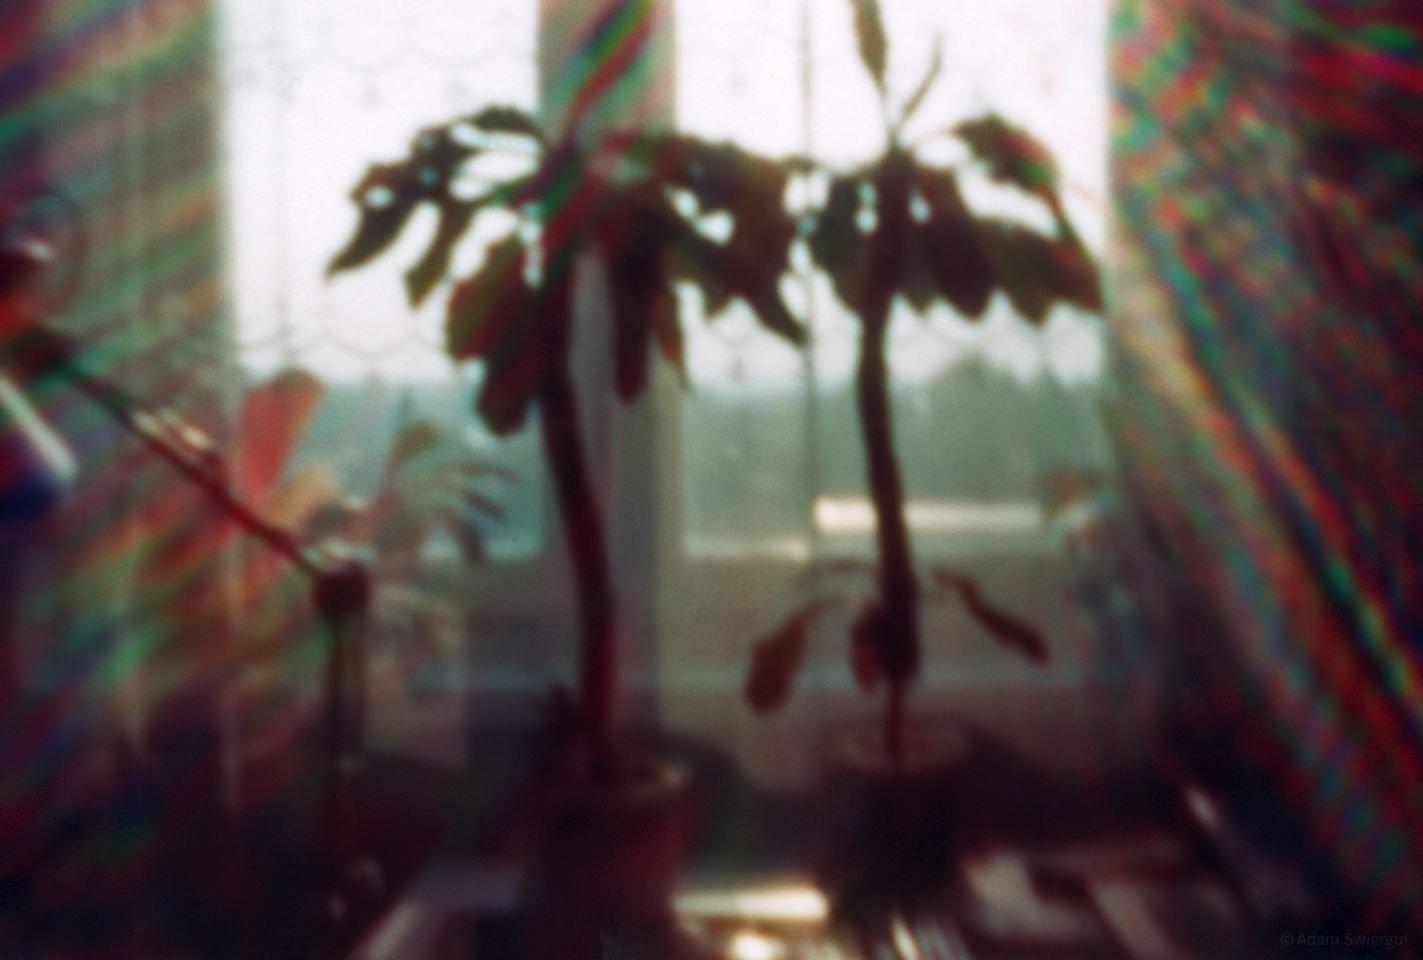 Okno 2 - b.mały otworek na lustrzance